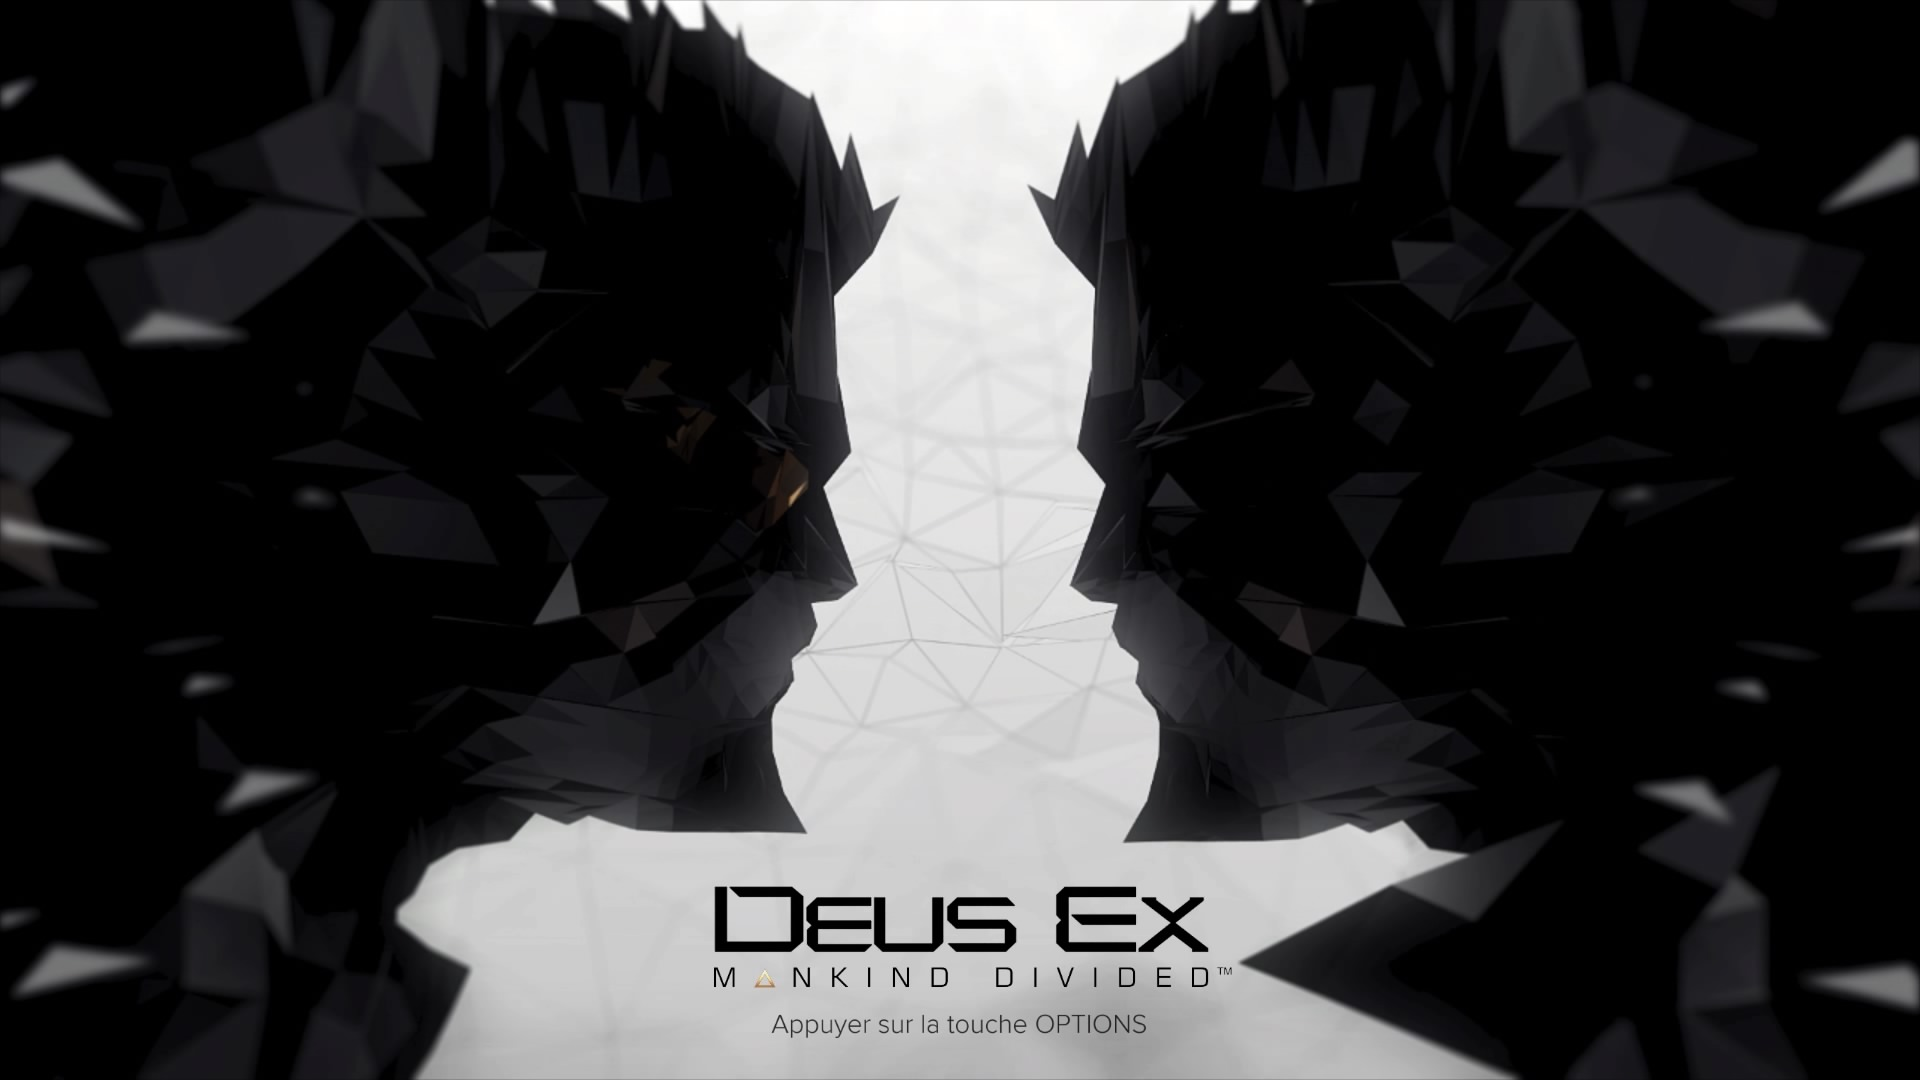 Deus Ex Mankind Divided Home